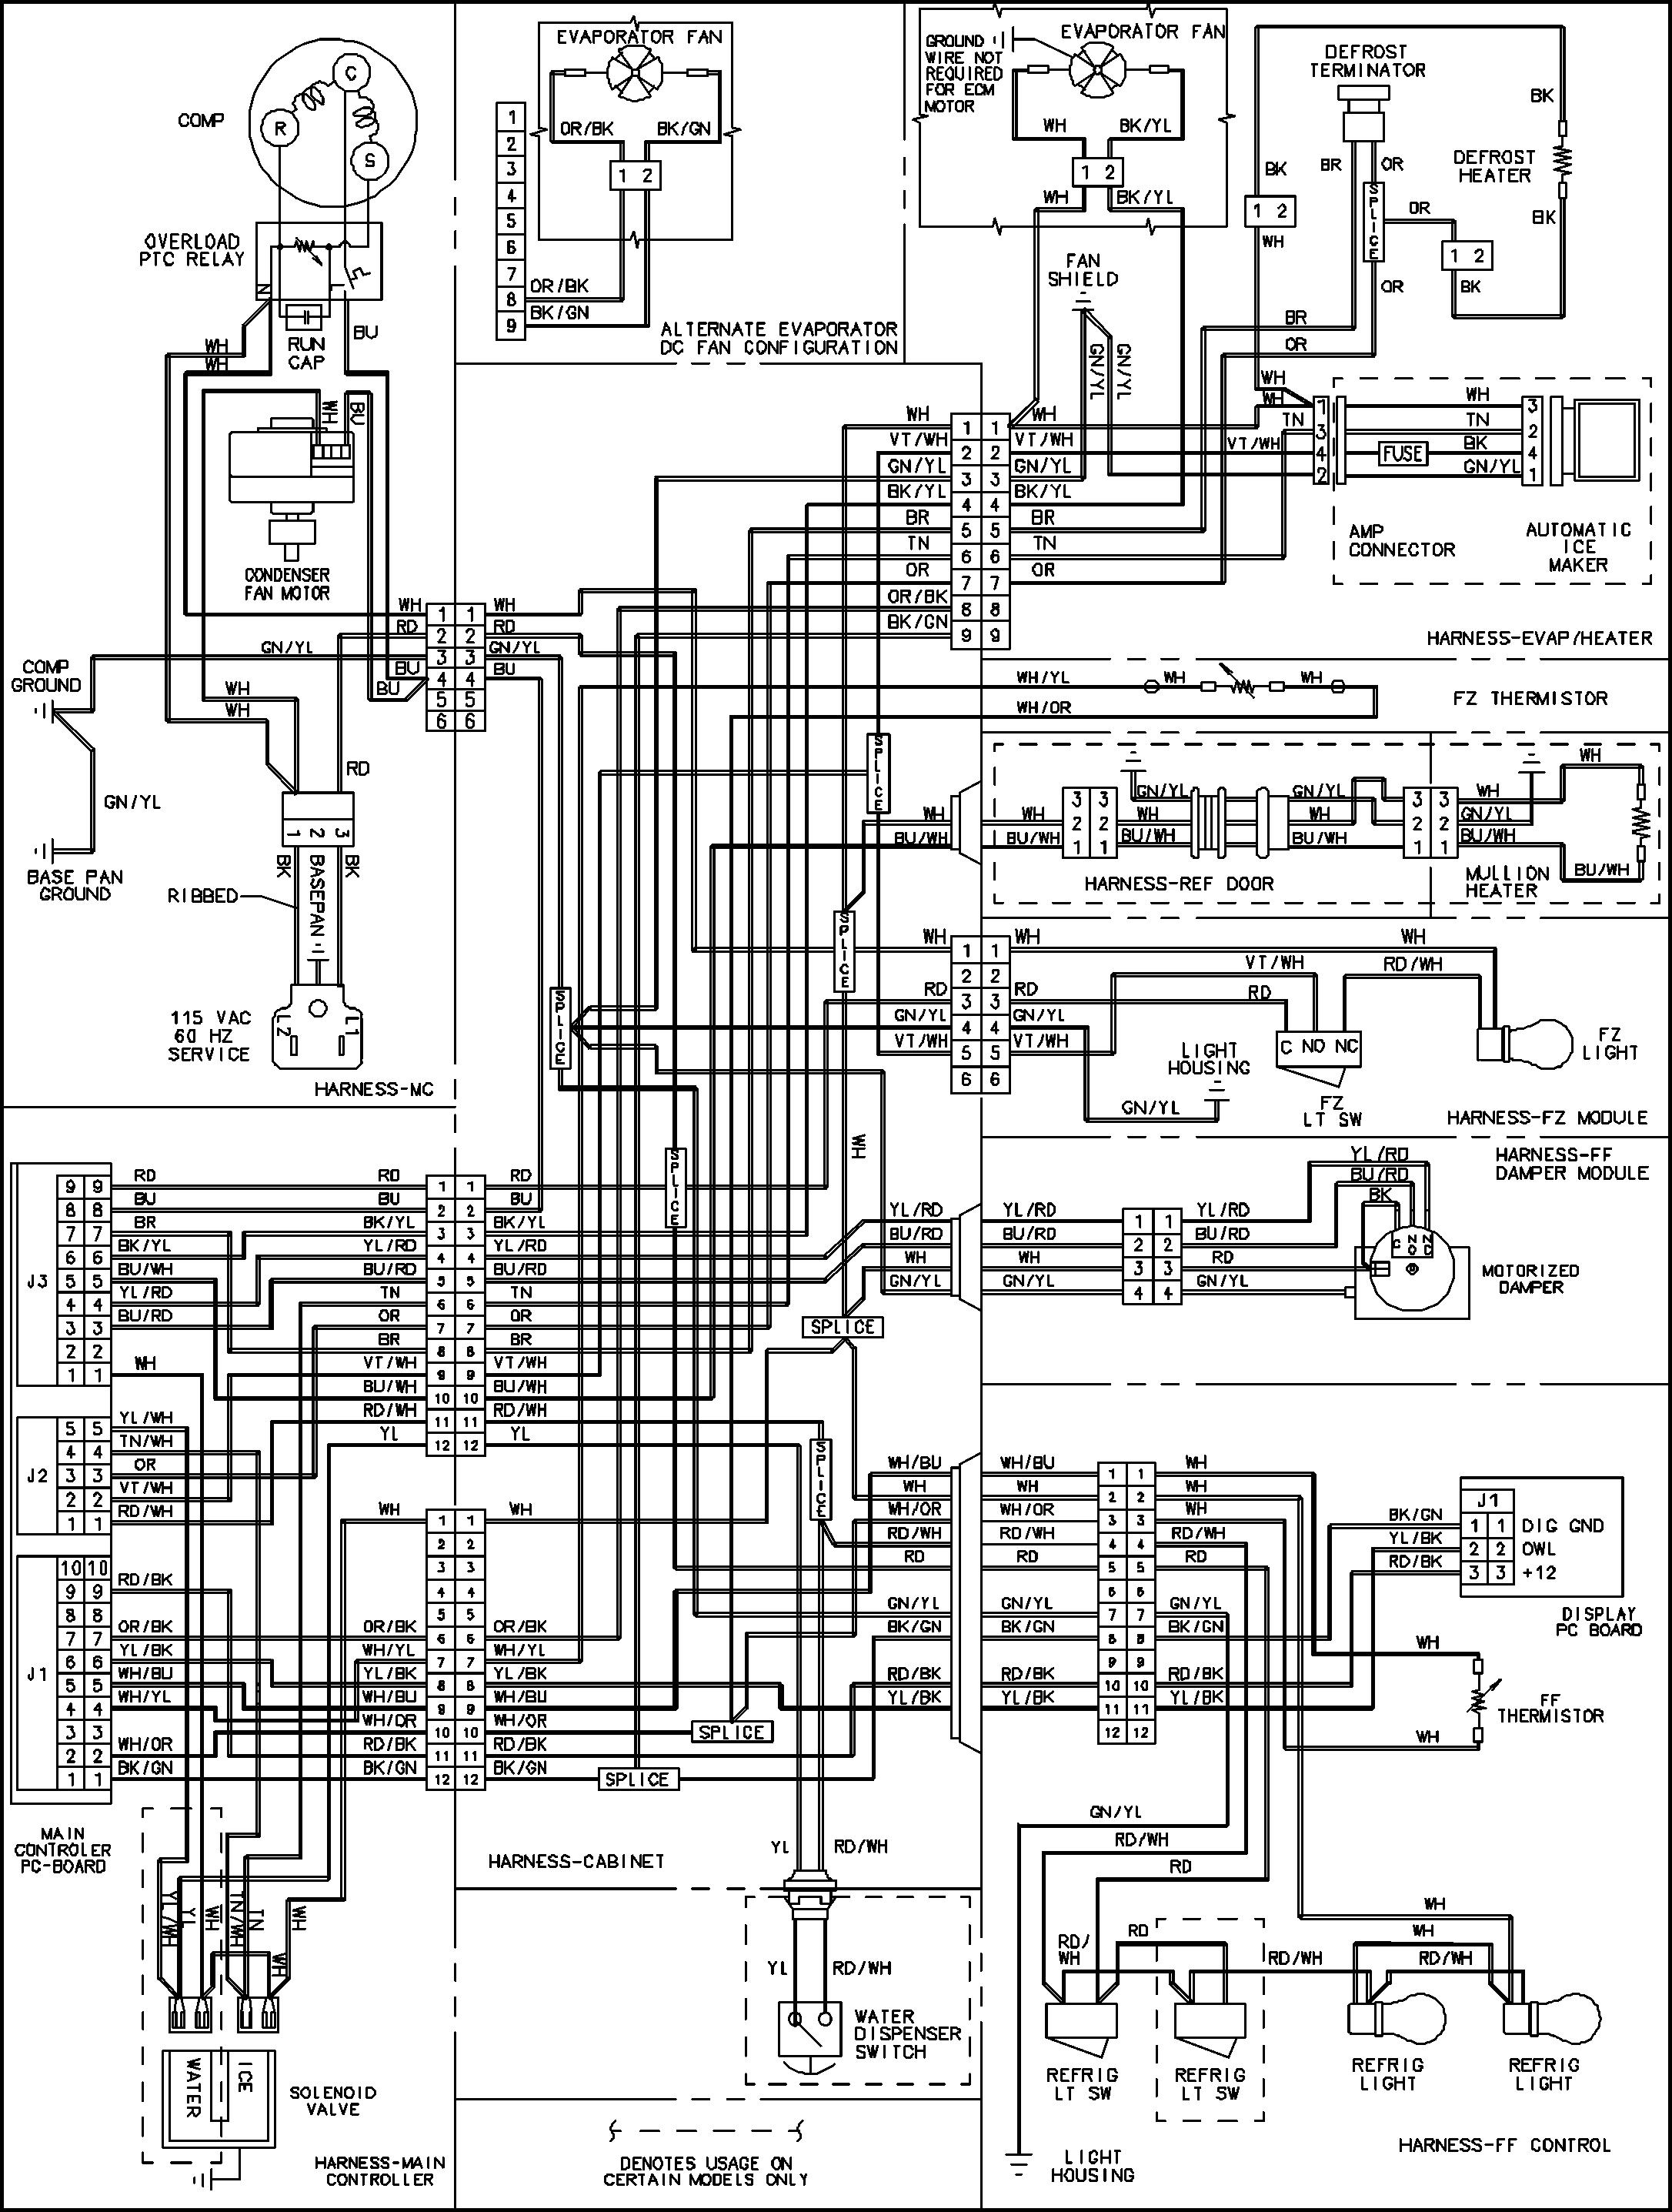 AT_0473] Whirlpool Refrigerator Pressor Wiring Diagram Download DiagramVulg Xeira Astic Hete Ally Ostr Vira Mohammedshrine Librar Wiring 101